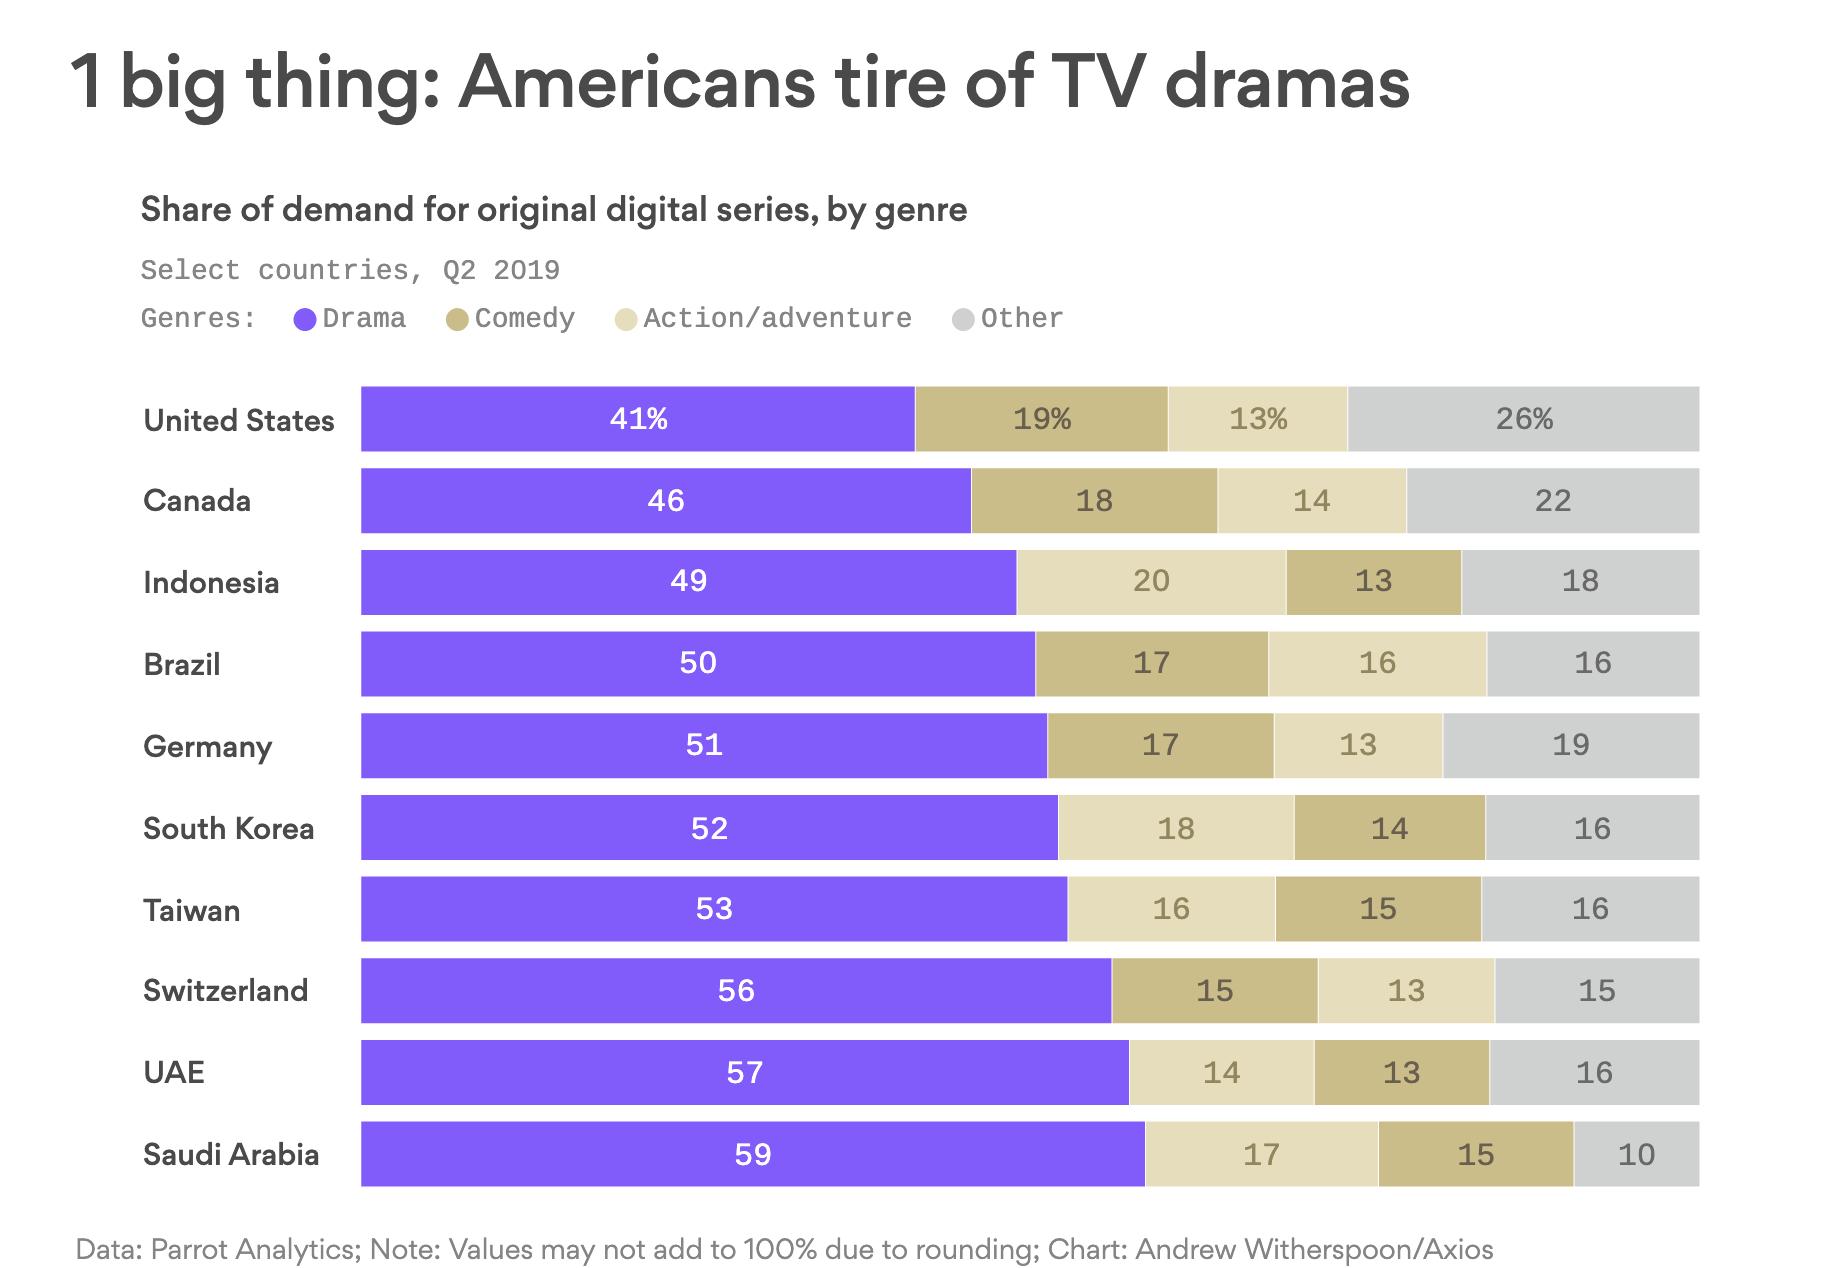 1 big thing: Americans tire of TV dramas